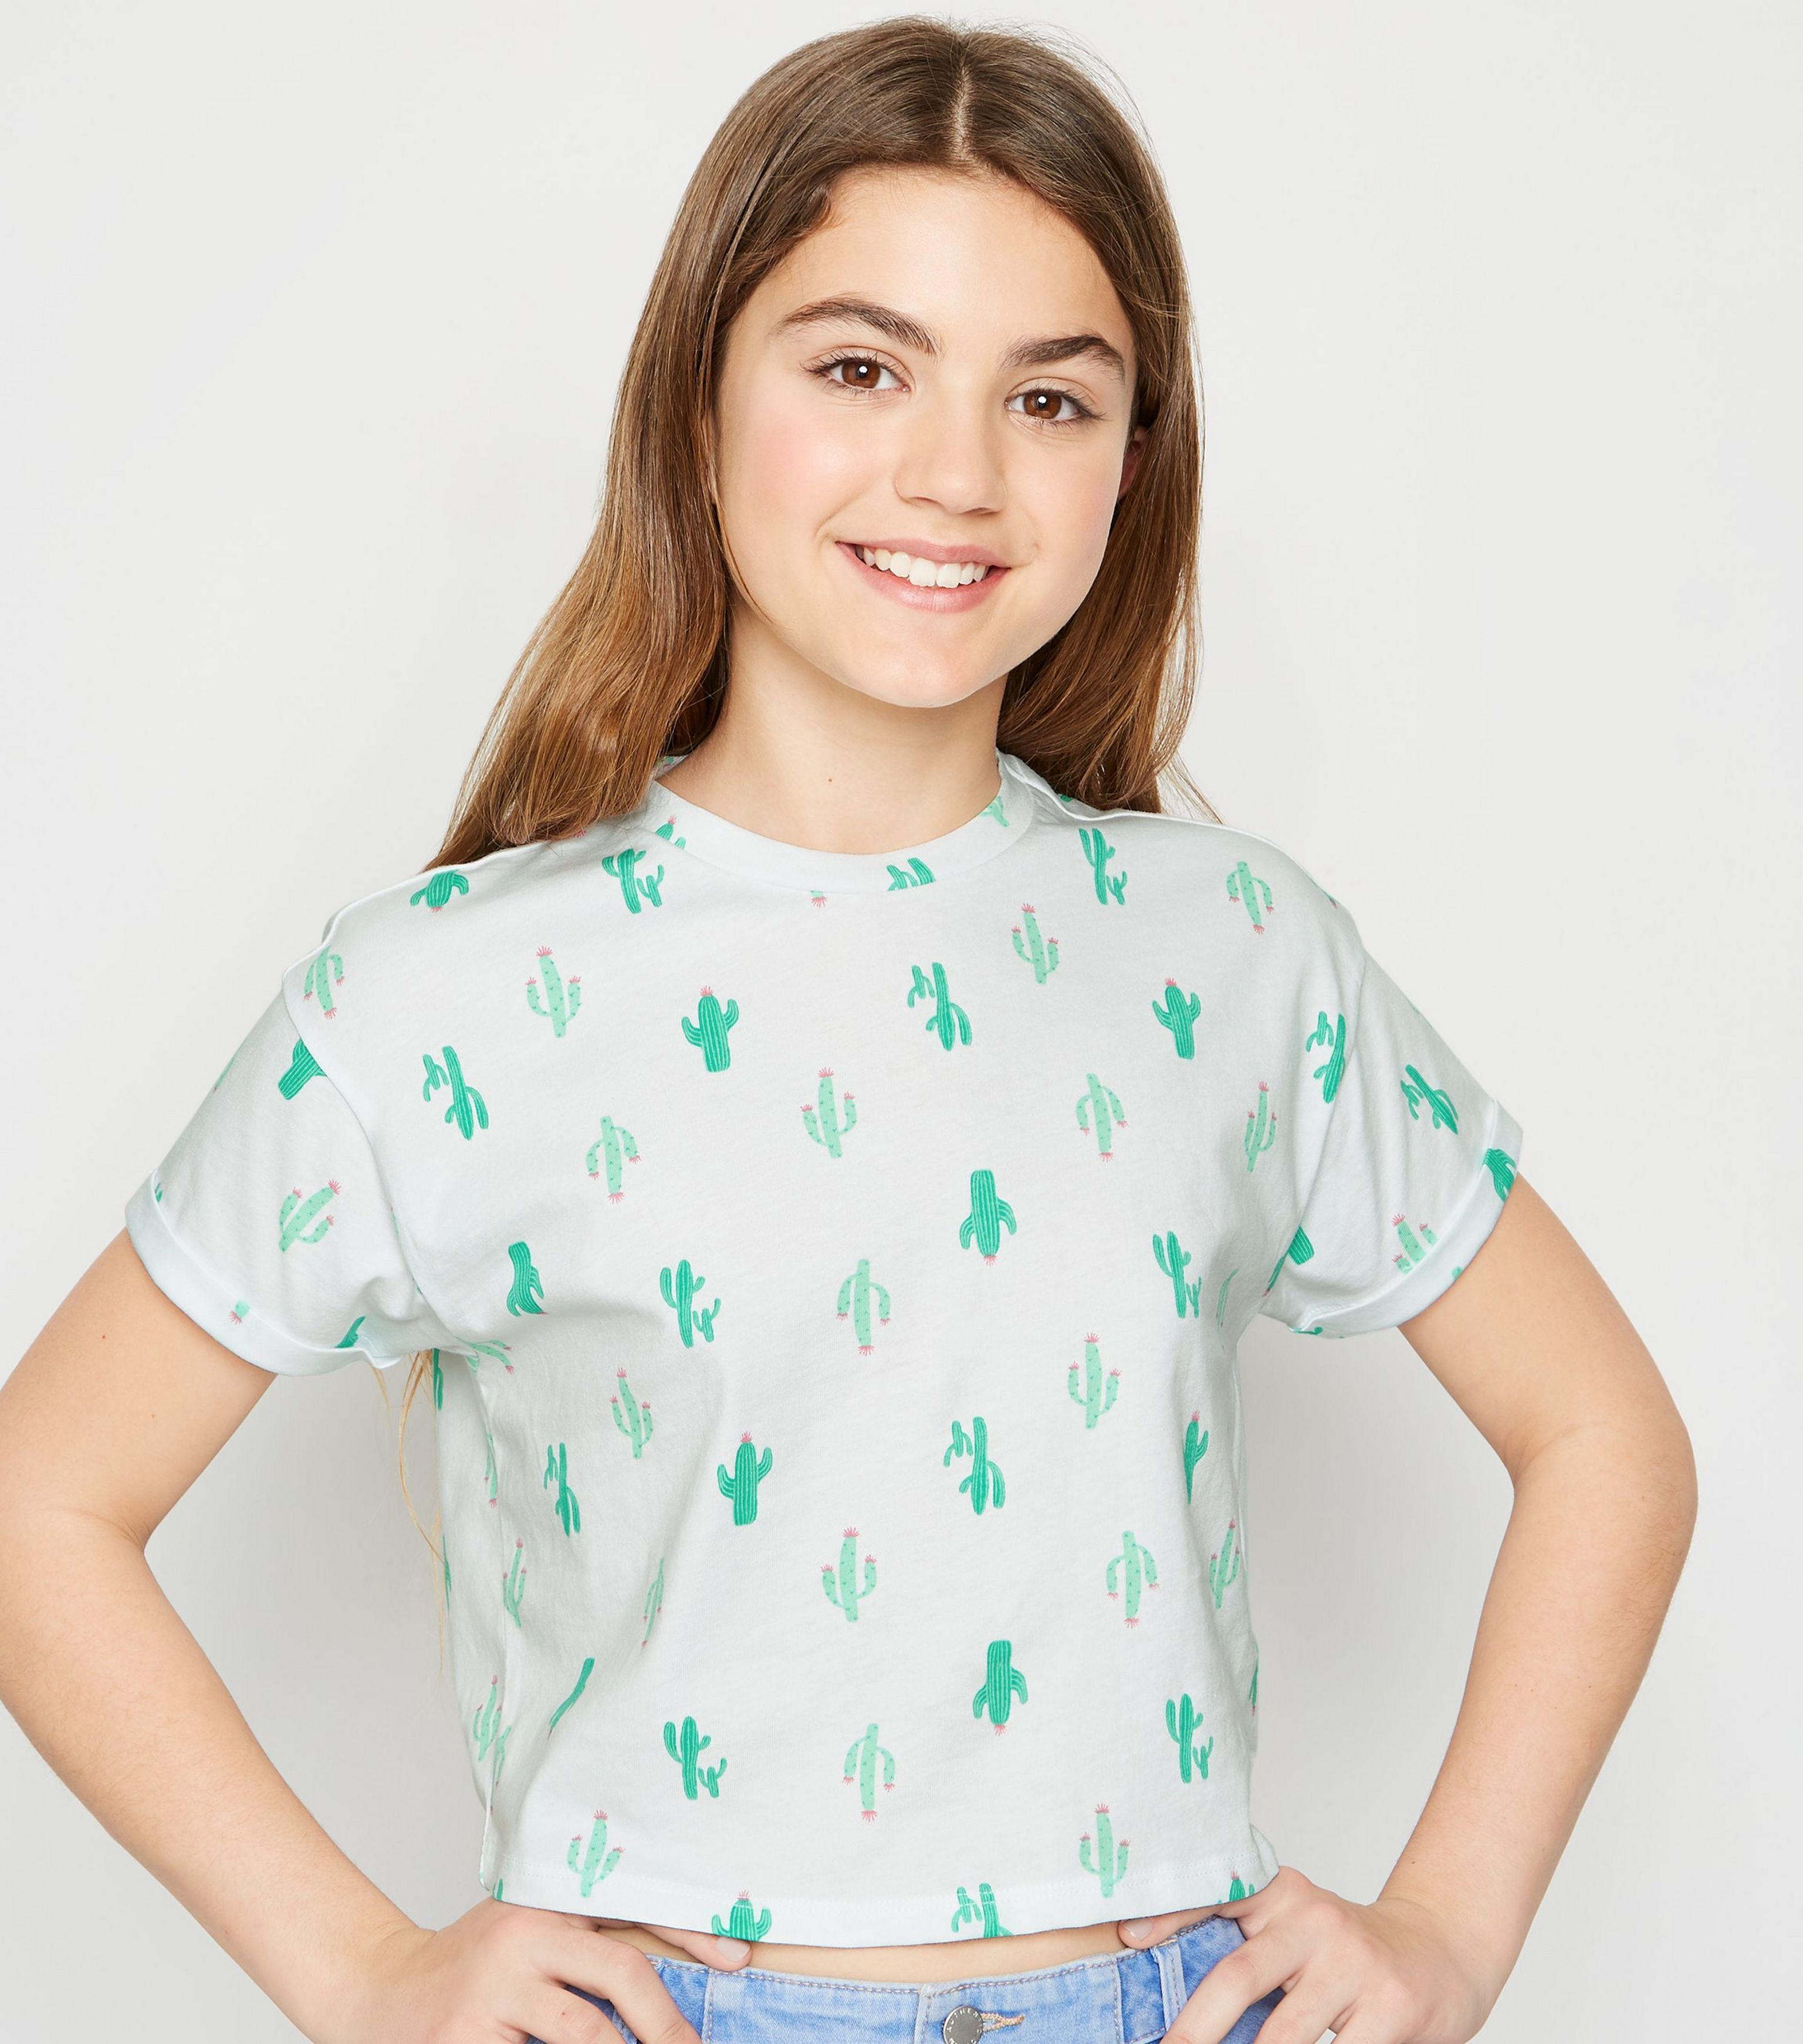 b6b60a5c6c2 New Look Girls White Cactus Print T-shirt in White - Lyst